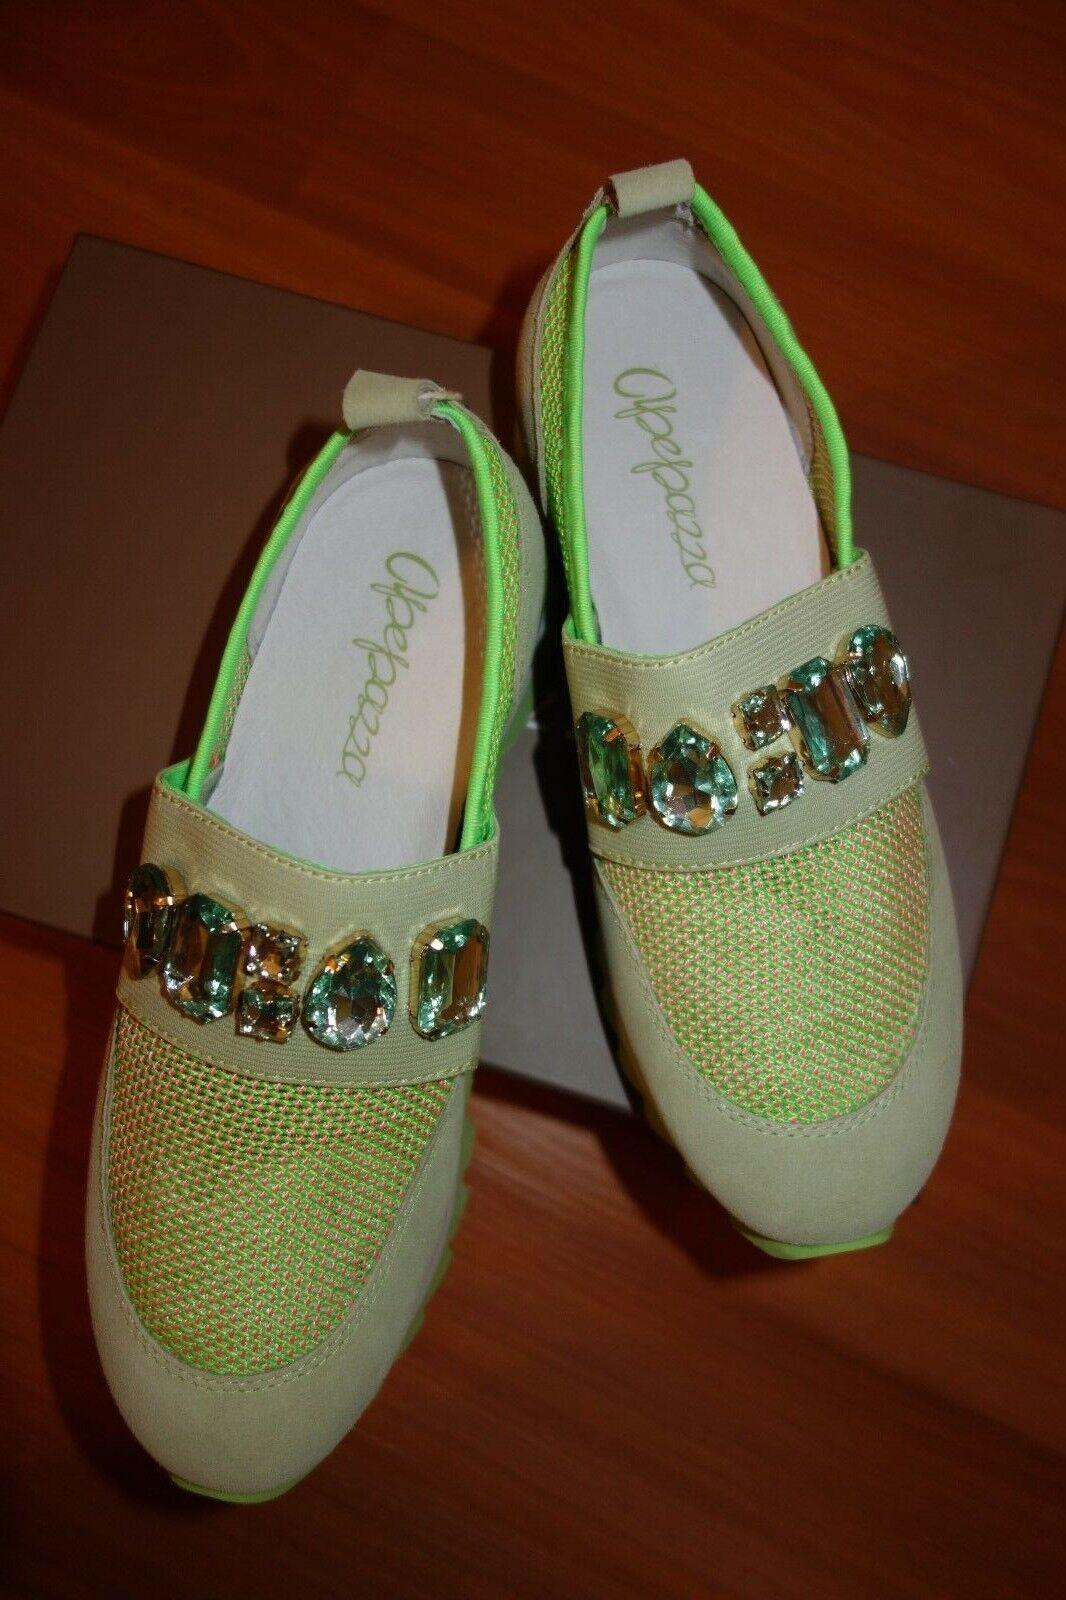 NEW APEPAZZA FASHION scarpe da ginnastica donna scarpe sz .US 9 M  8.5 M